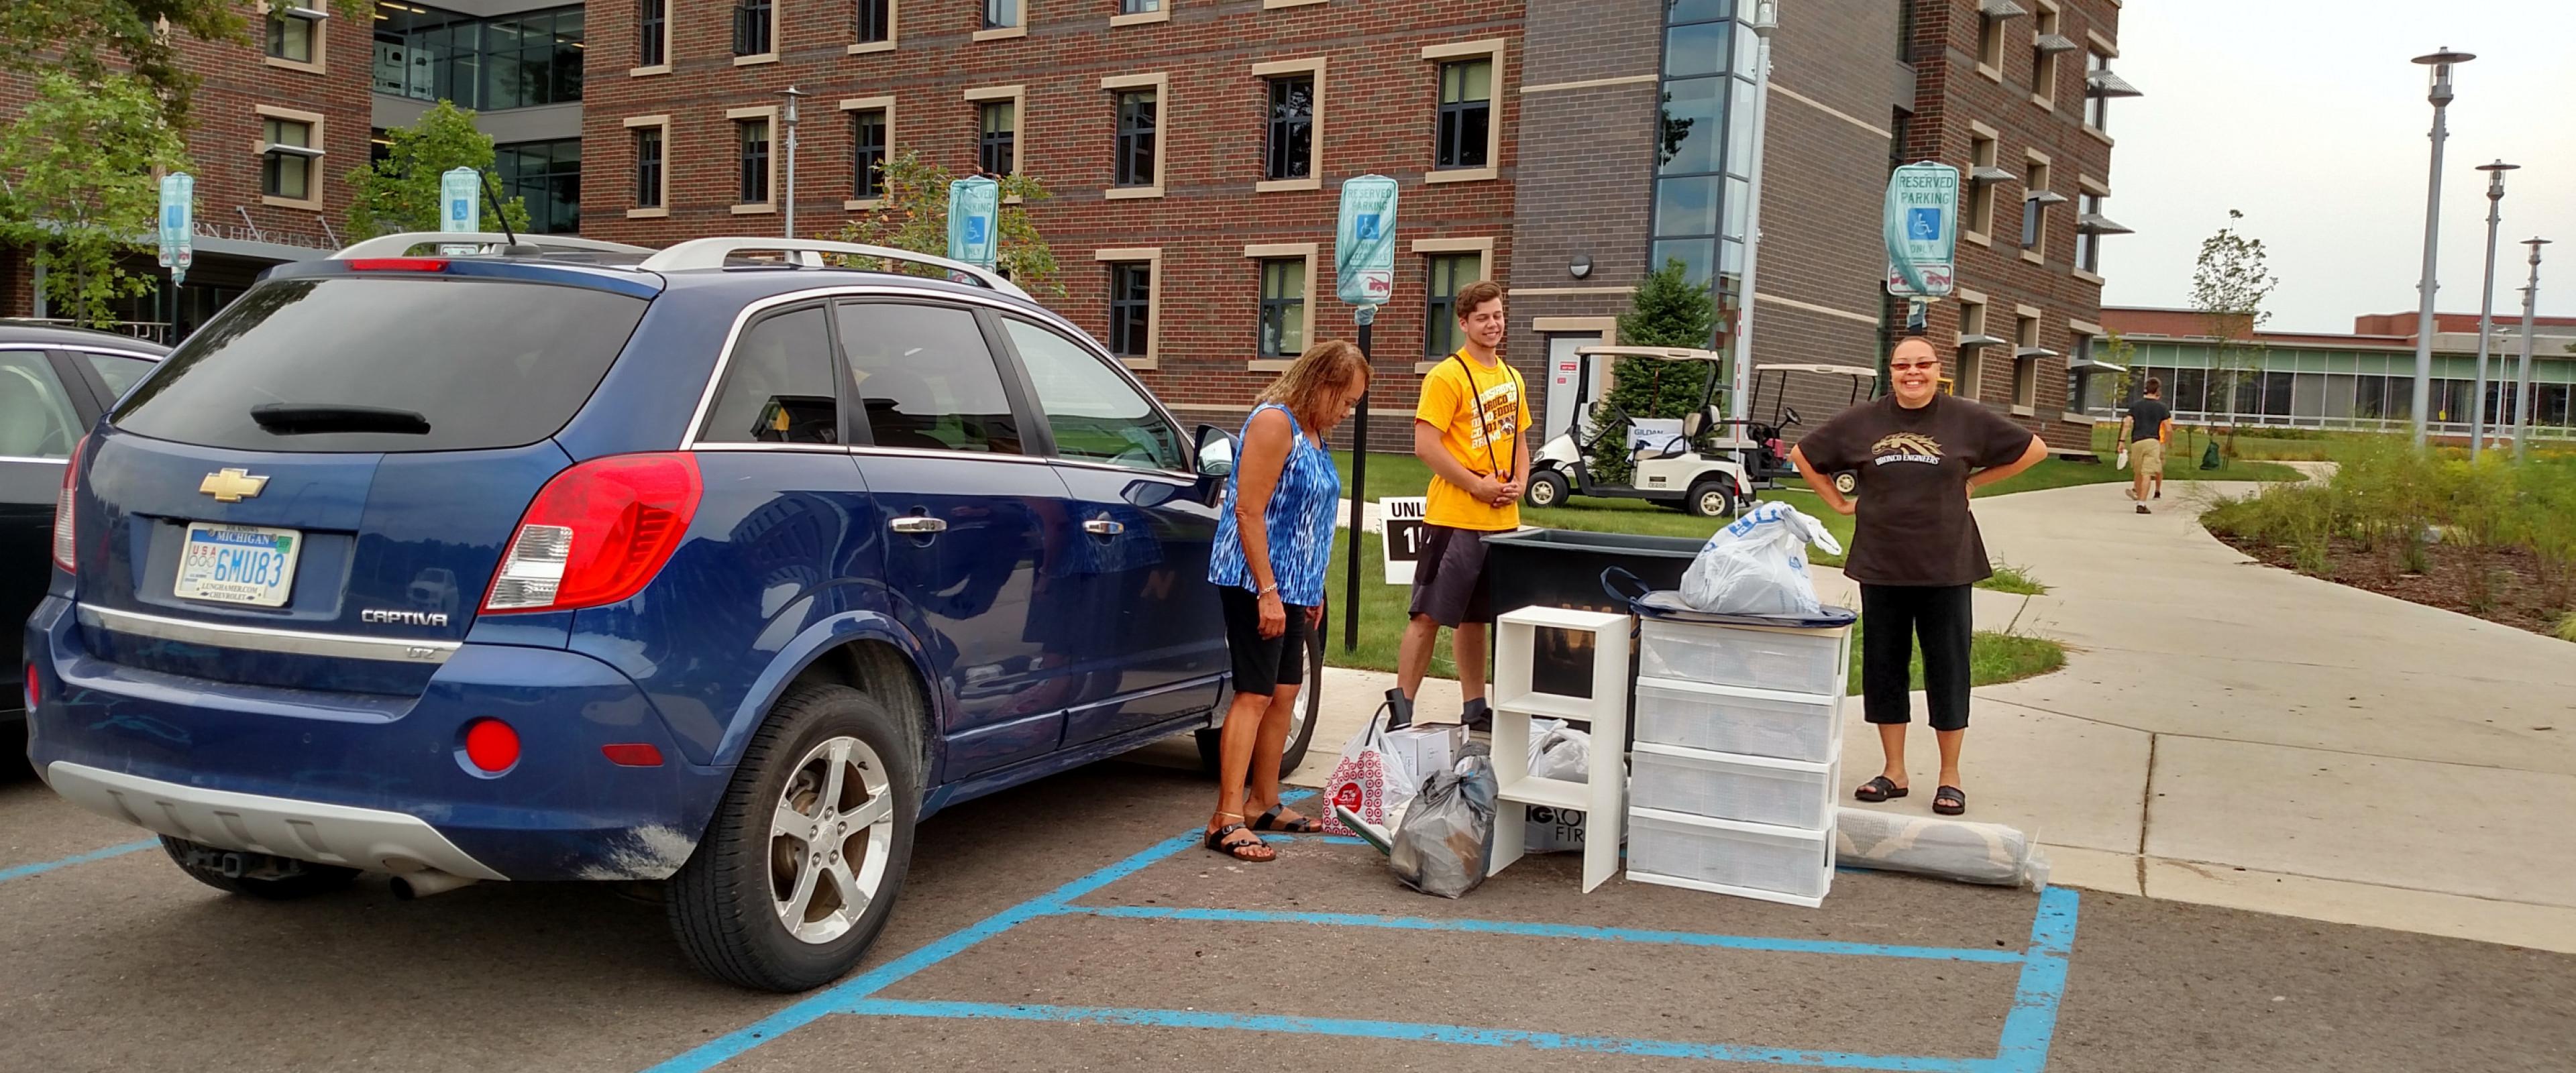 WMU family unloading car